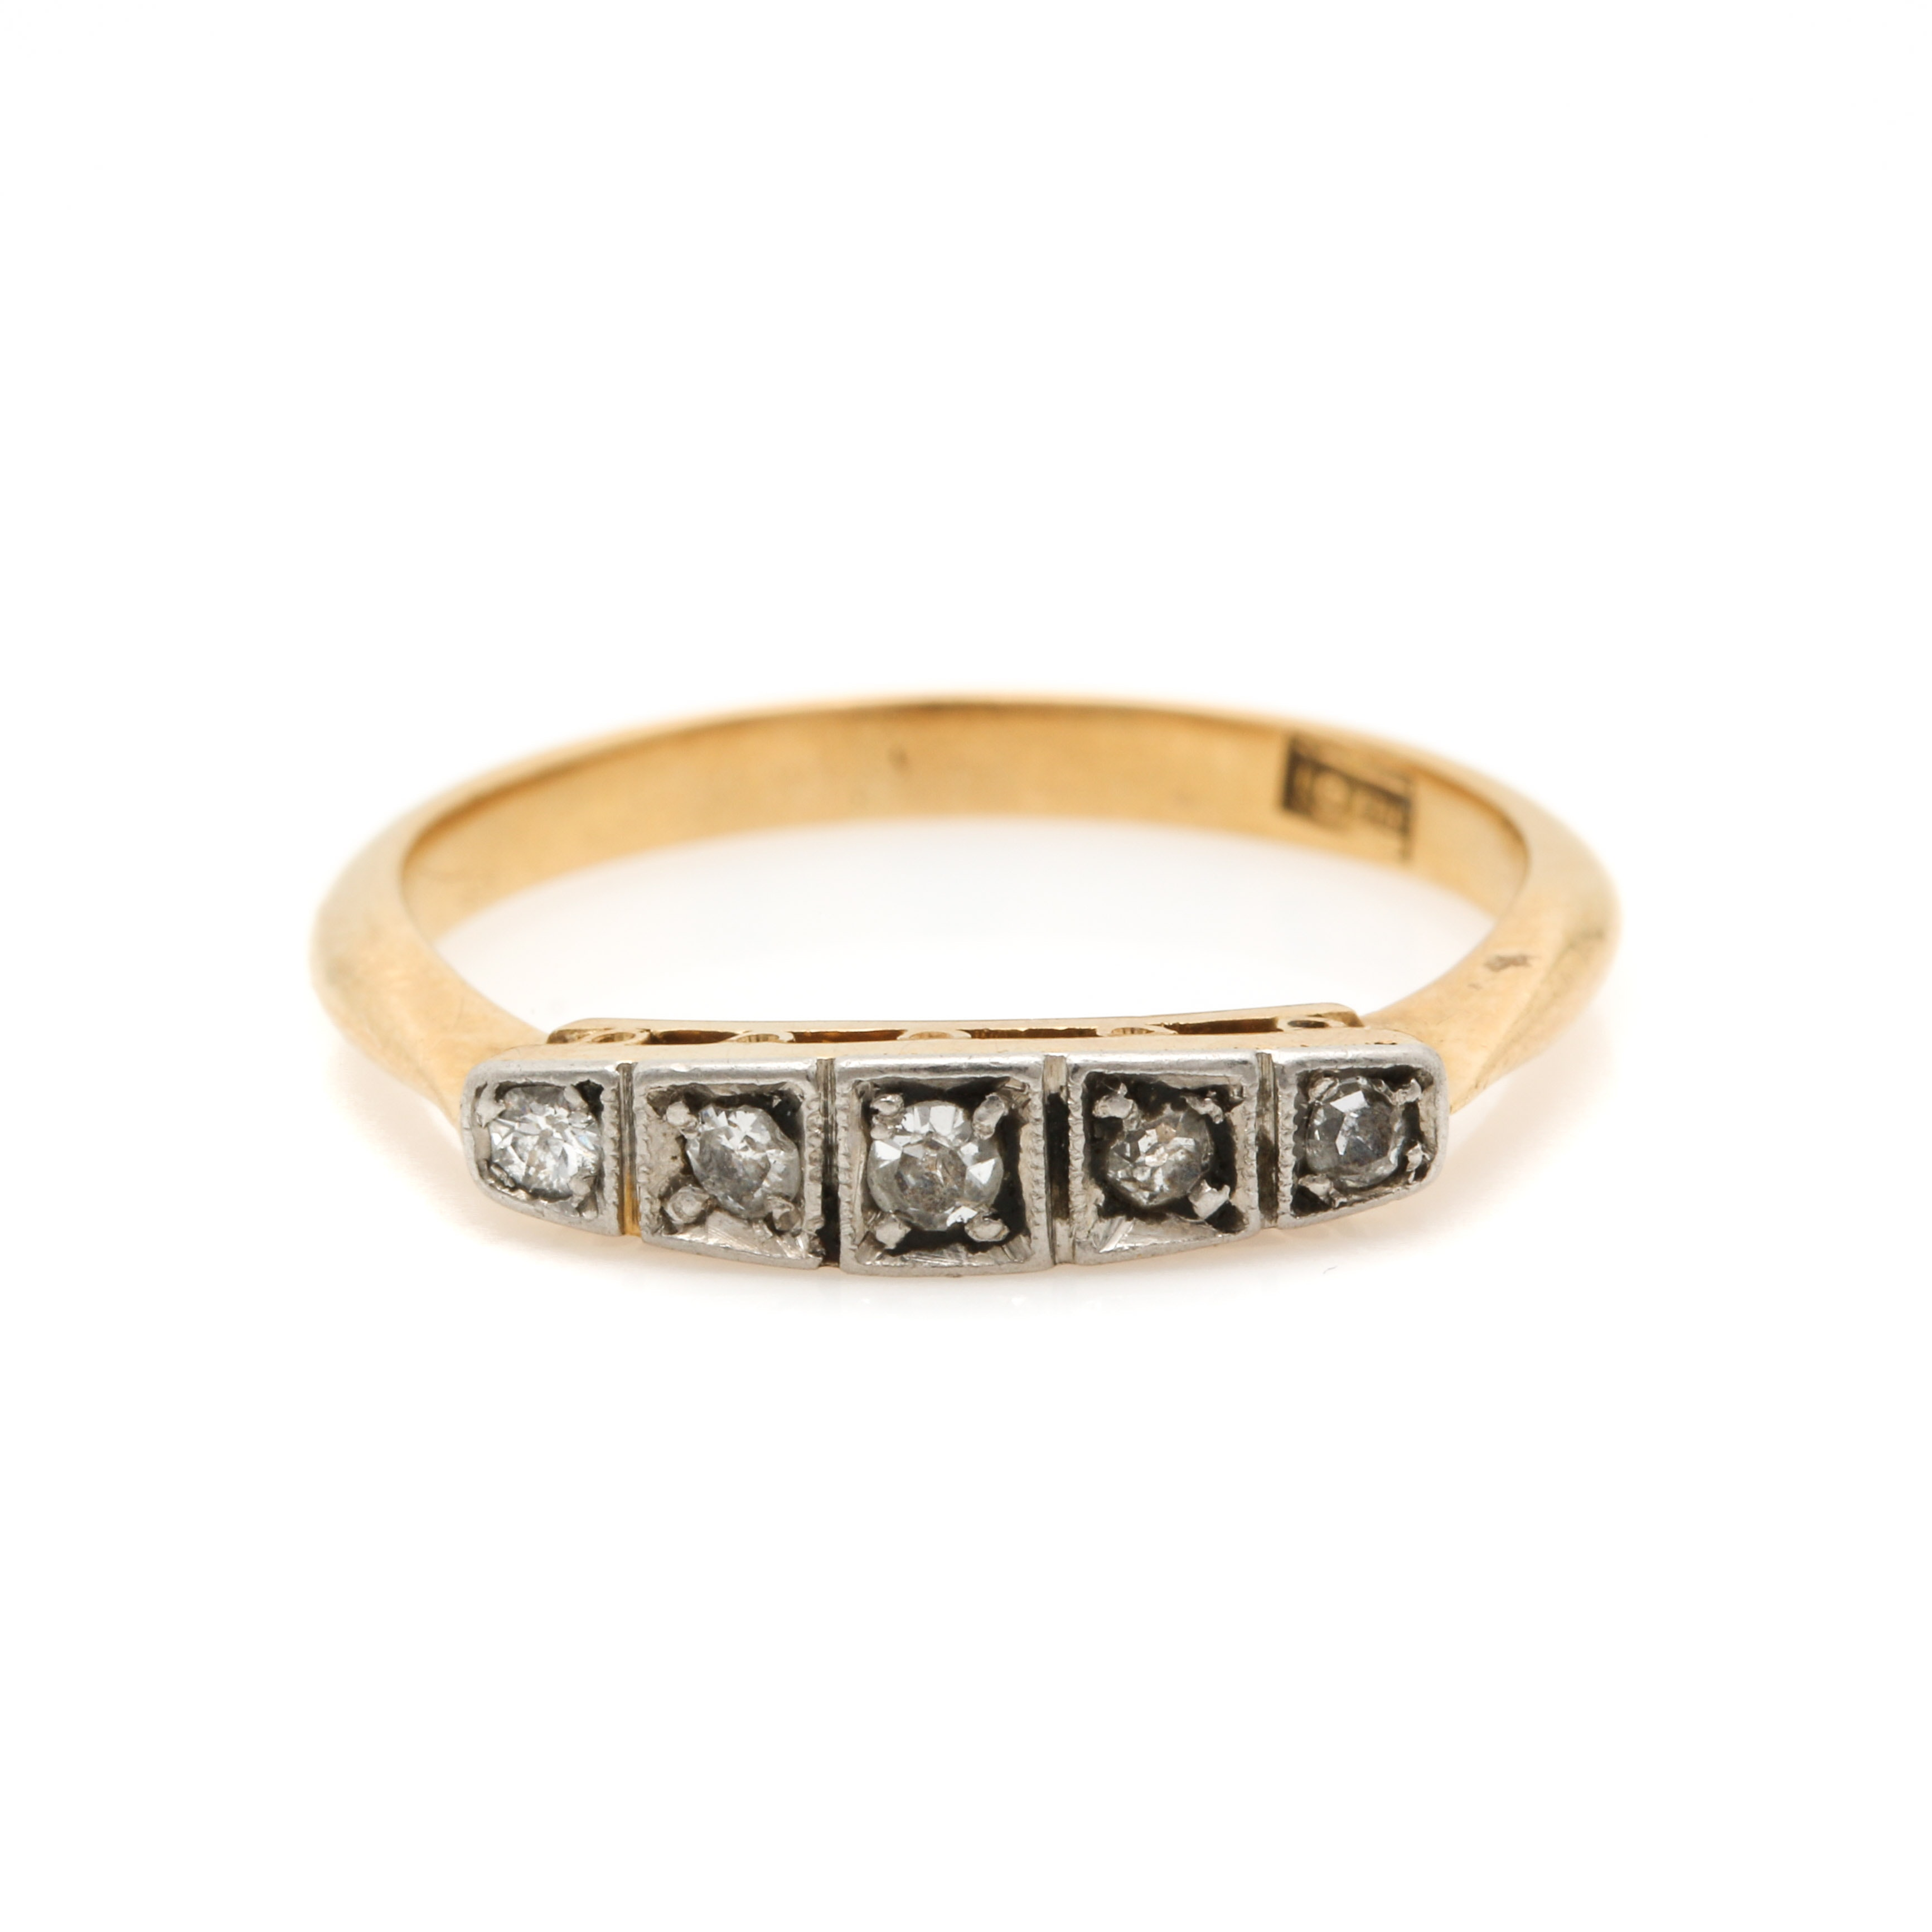 Vintage 18K Yellow Gold Diamond Ring